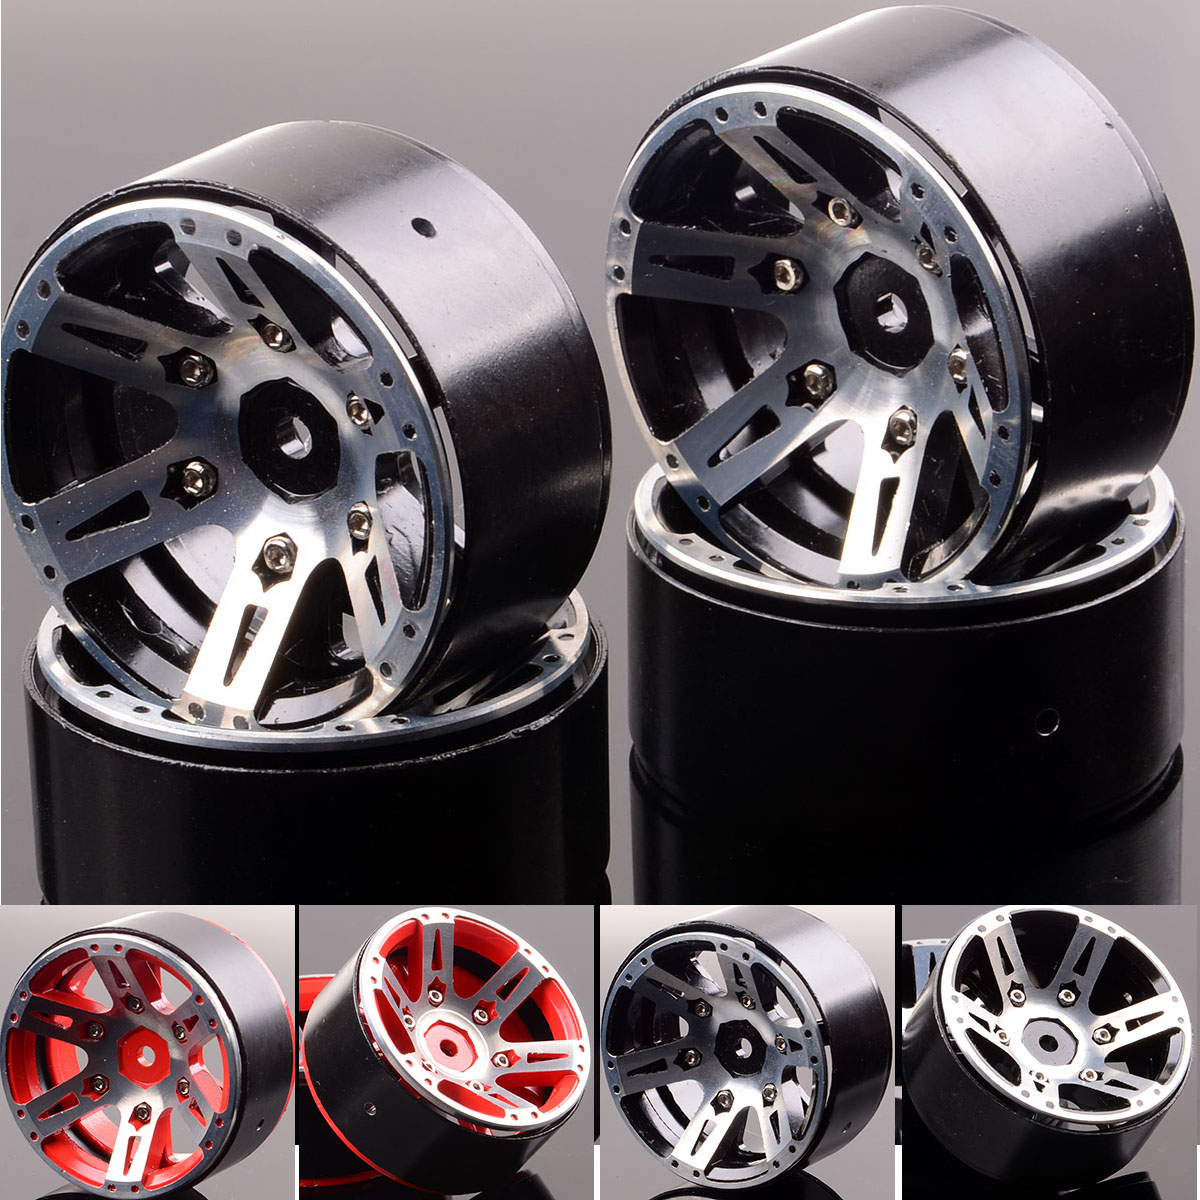 4xAluminum Rock Crawler 1.9 Beadlock Wheel Rim 1059 For RC 1:10 Axial SCX10 D90 4 pcs lot black alloy 1 10 rc crawler 1 9 beadlock wheels for scx10 d90 90034 90035 aluminum rim free shipping